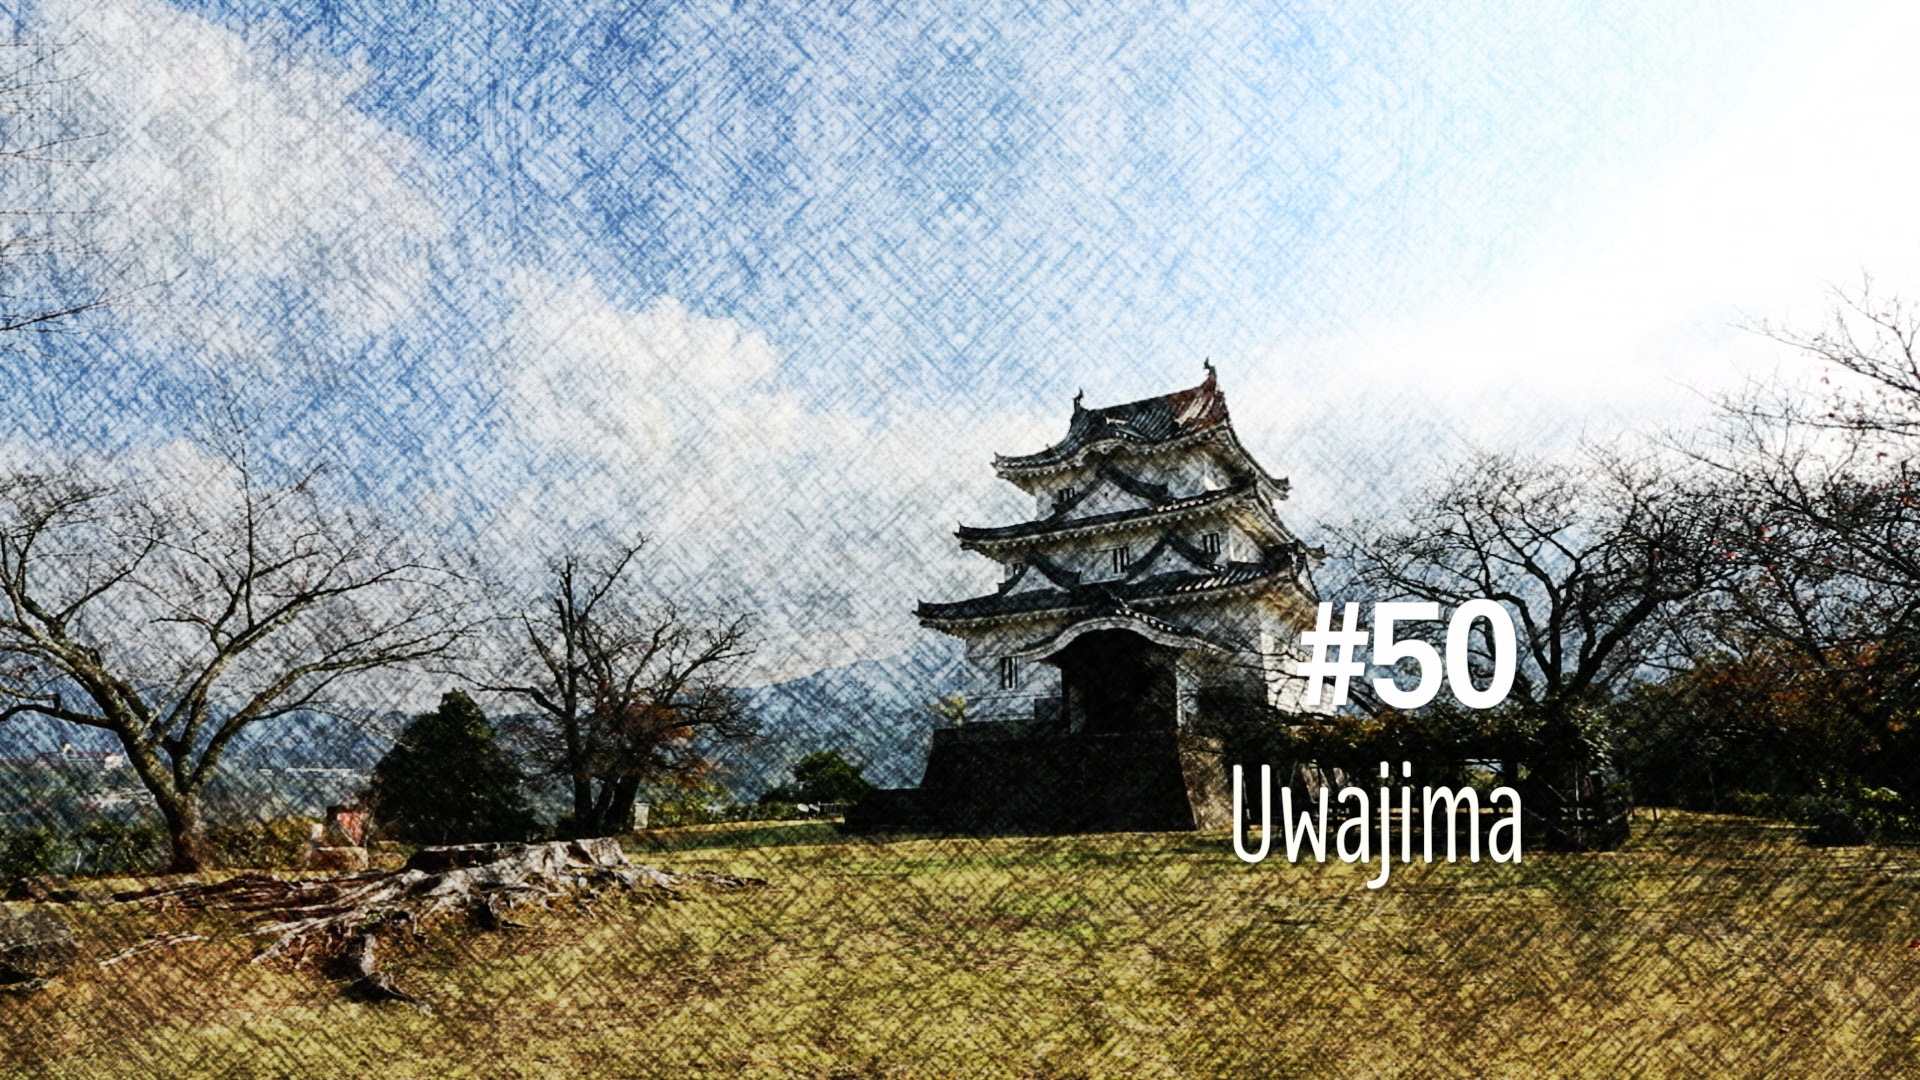 Le château de Uwajima (#50)